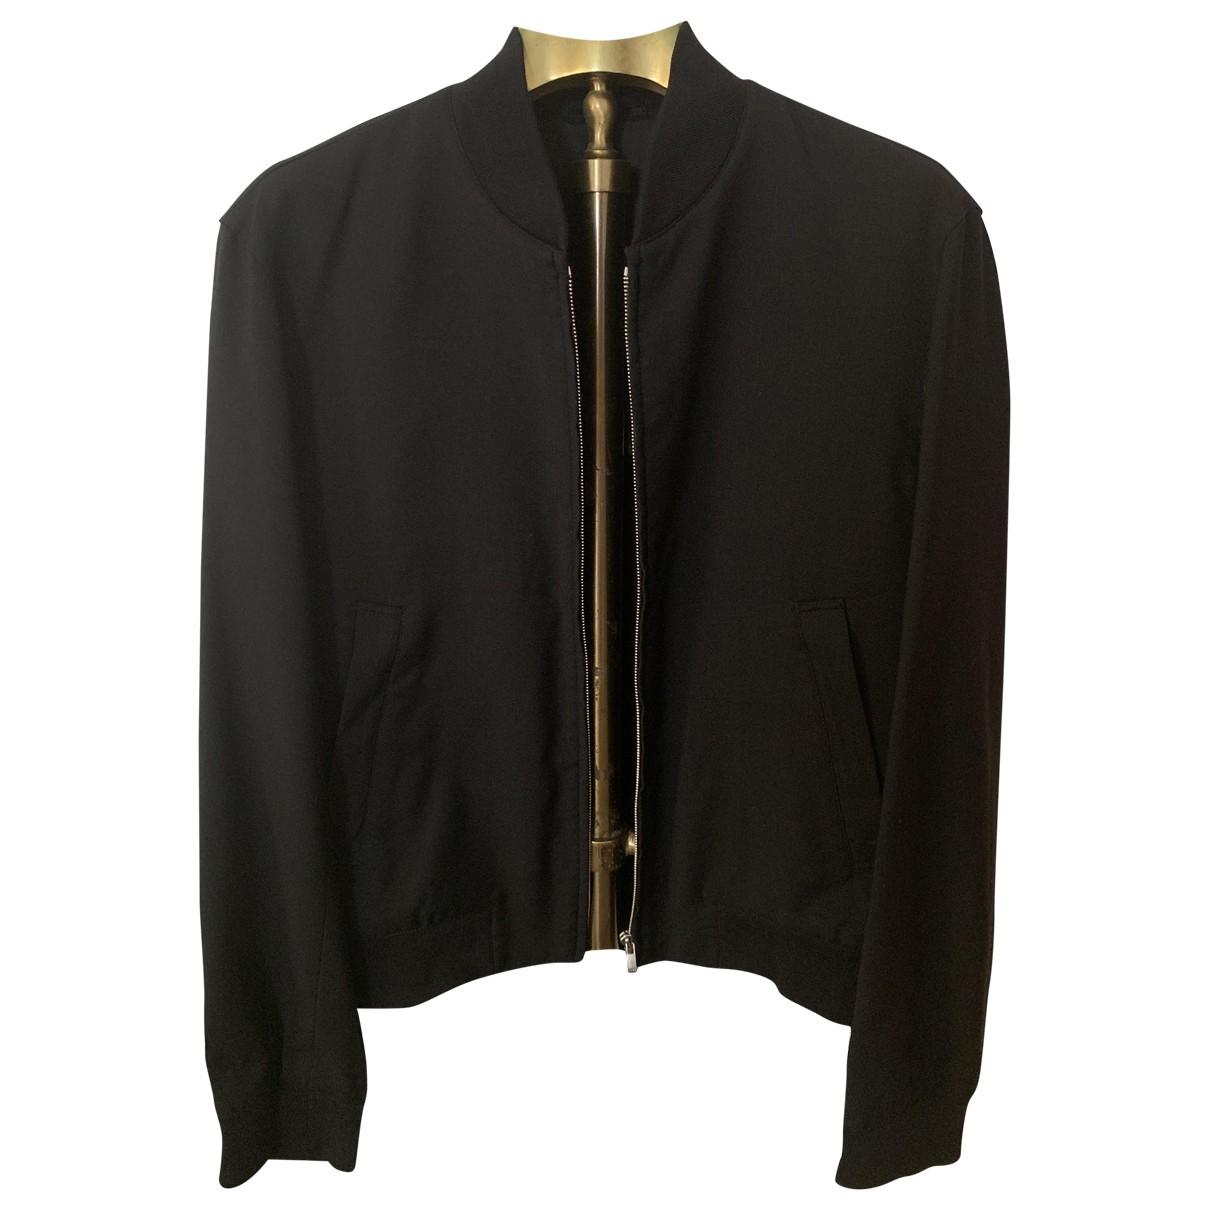 Hugo Boss \N Black Wool jacket  for Men M International